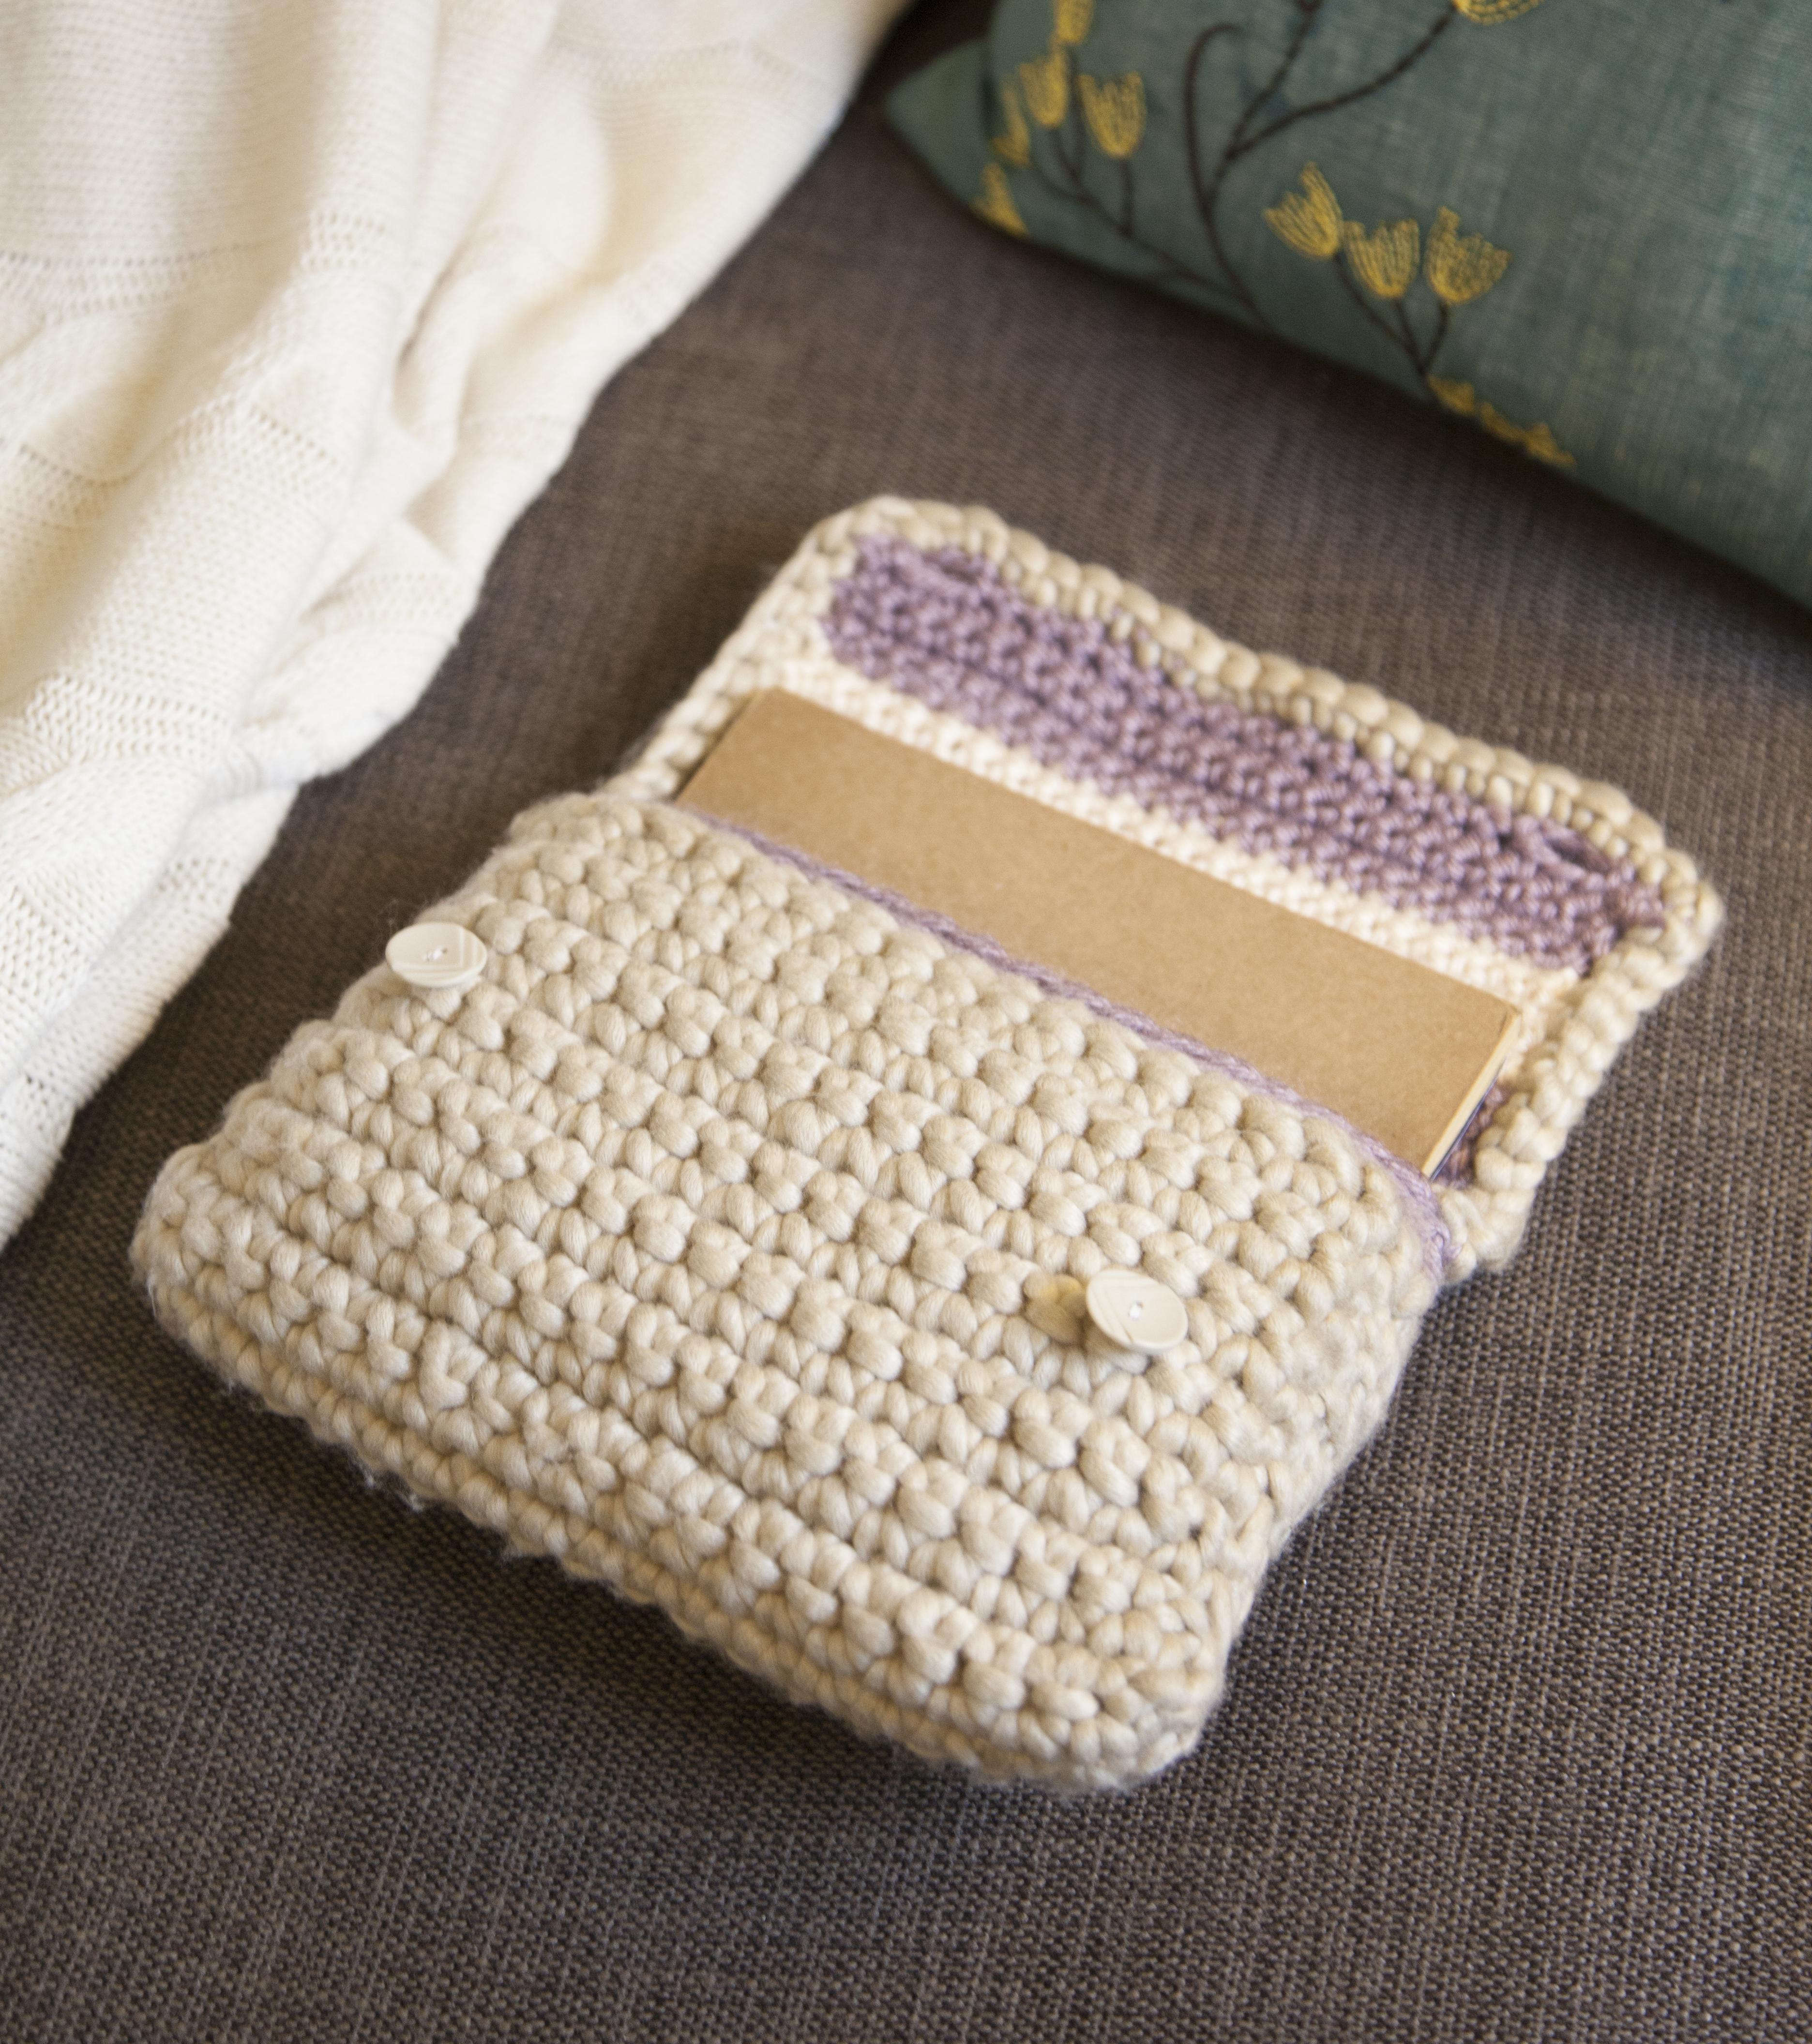 Crocheted Case | grannysquaredontcare